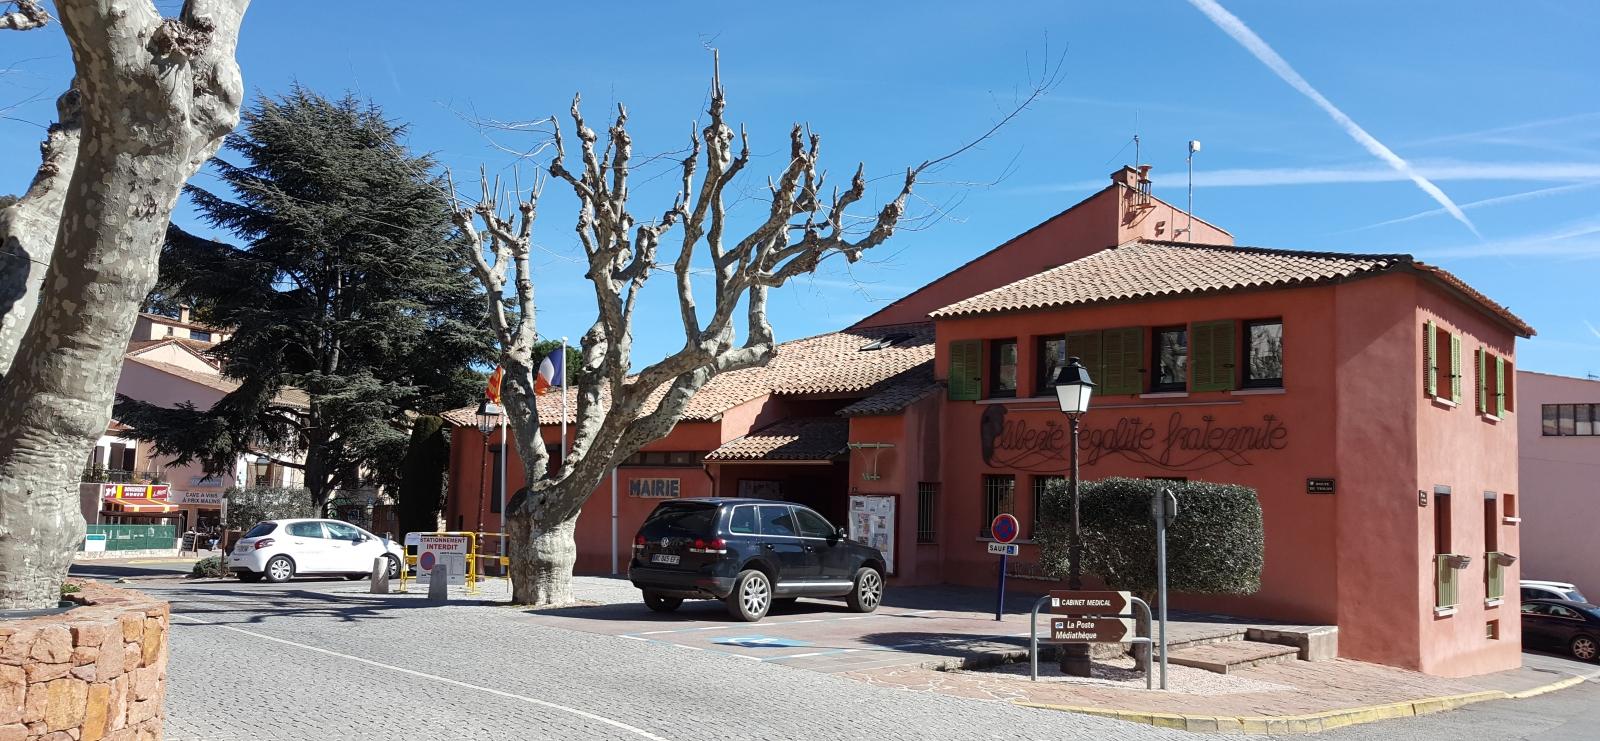 Mairie de Les Adrets de l'Esterel